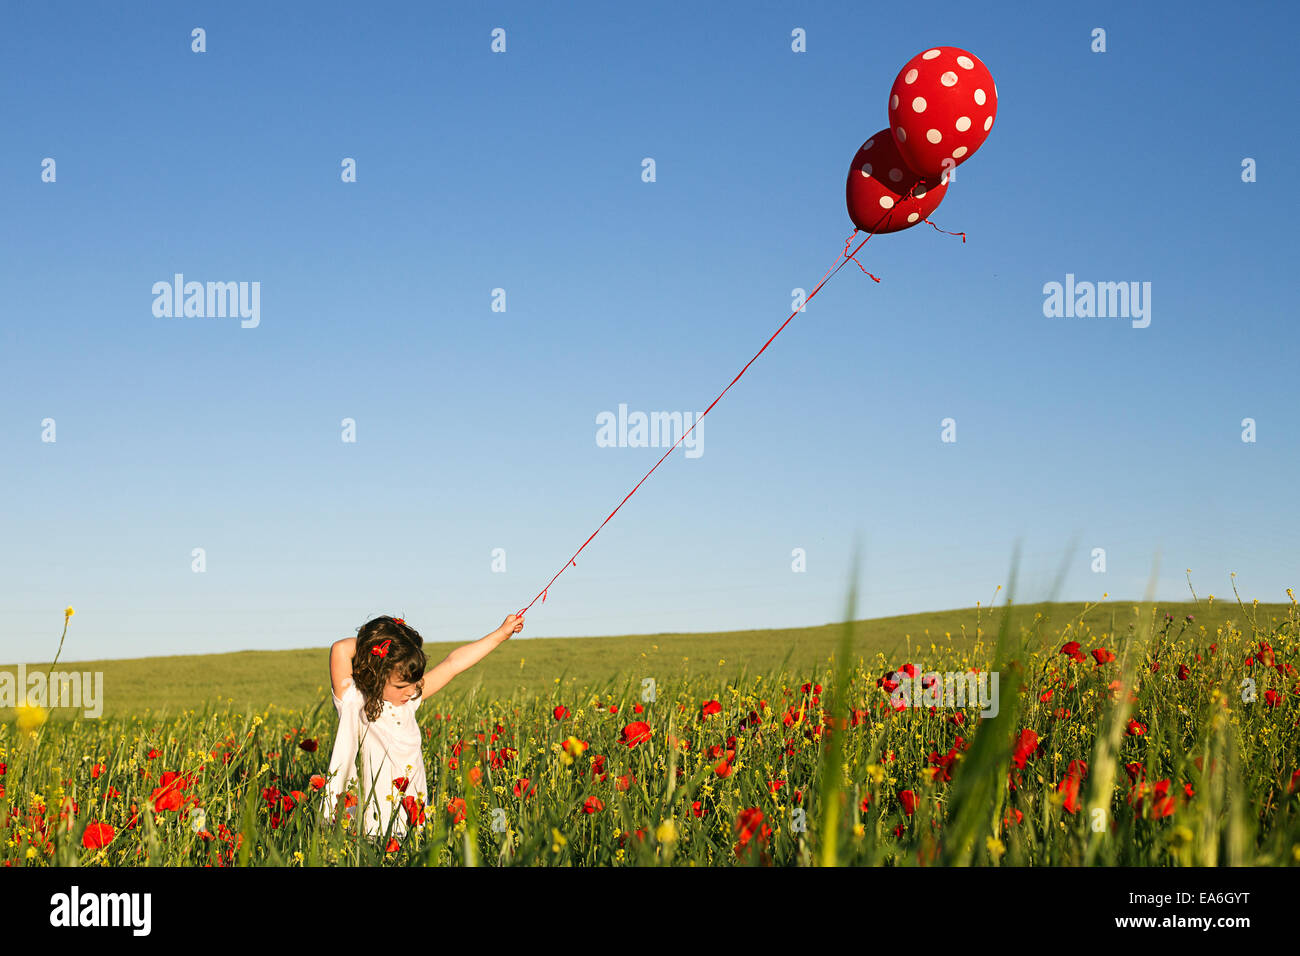 Girl standing in a field of poppy flowers holding polka dot balloons - Stock Image